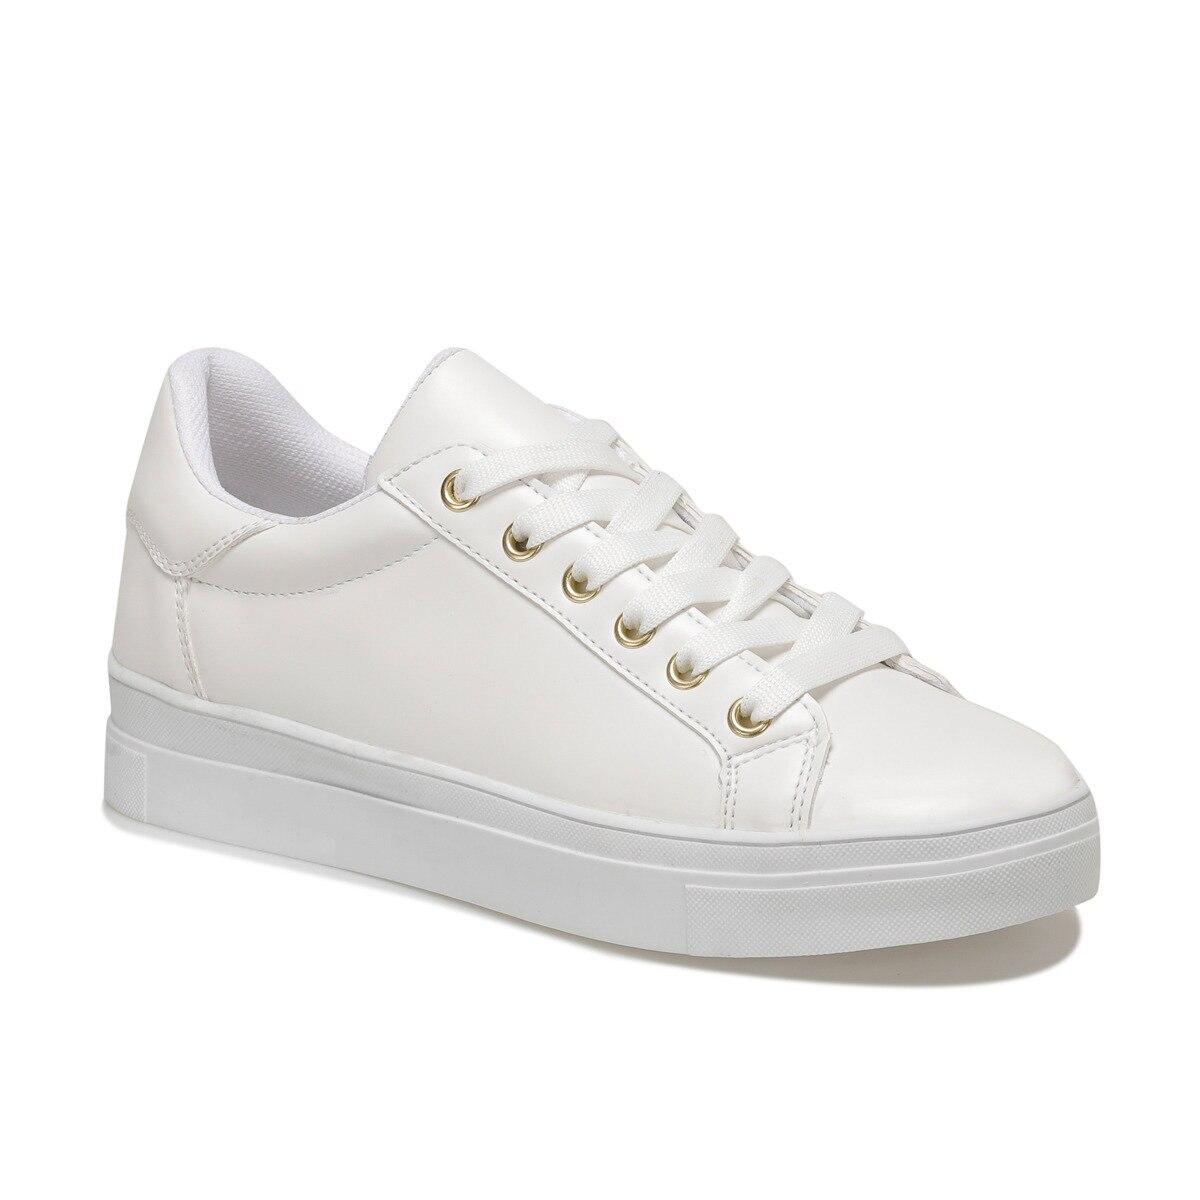 FLO 20S-095 White Women 'S Sneaker Shoes BUTIGO